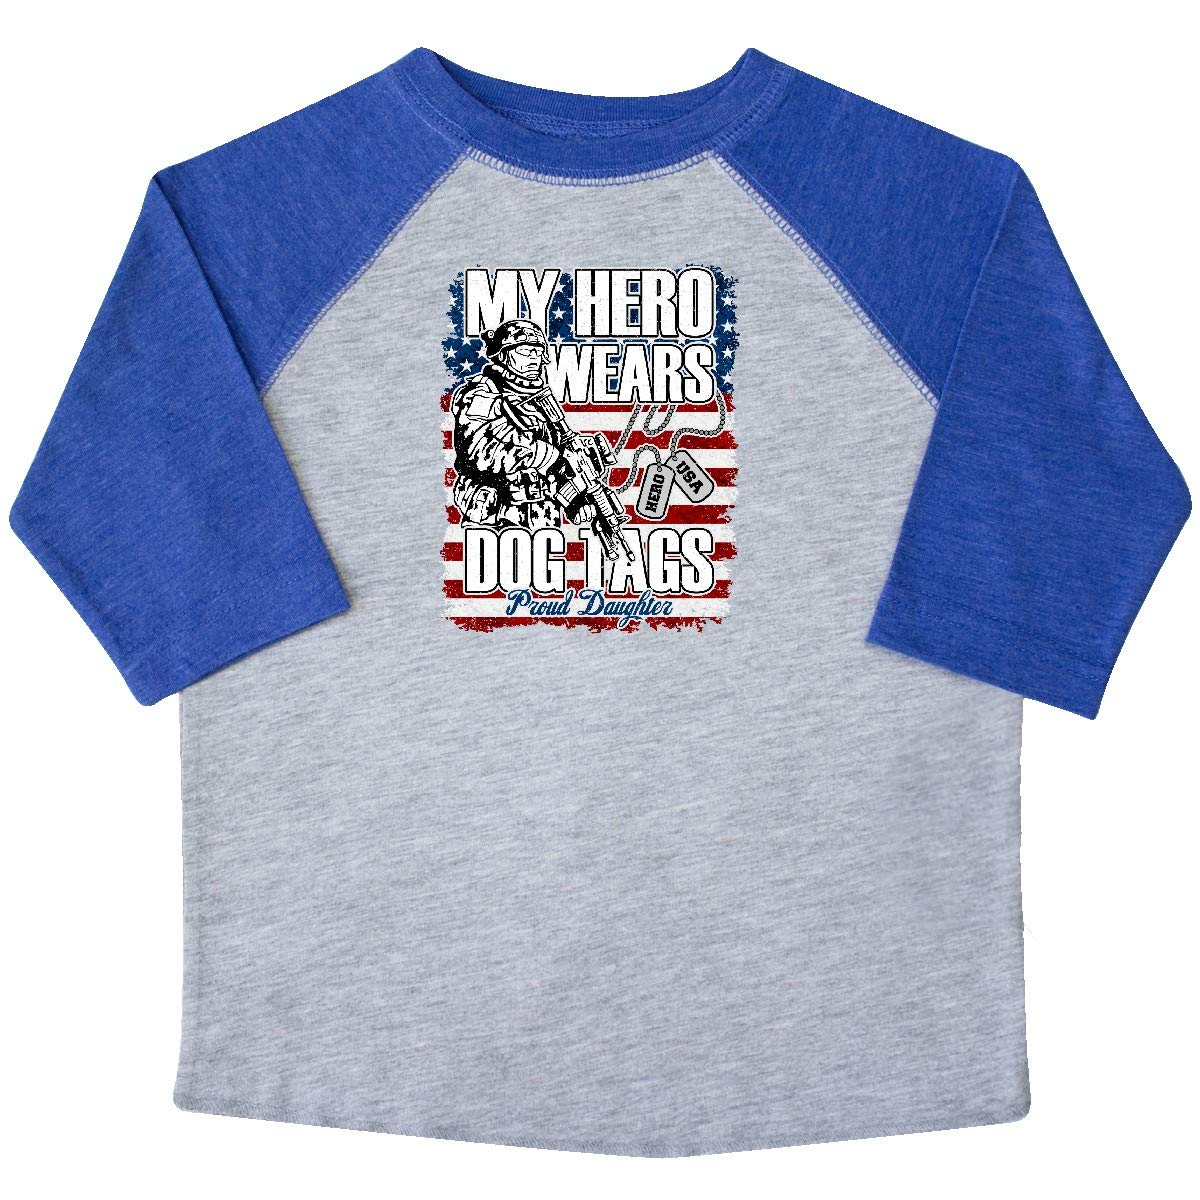 inktastic Military Proud Daughter Hero Wears Dog Tags Girls Toddler T-Shirt